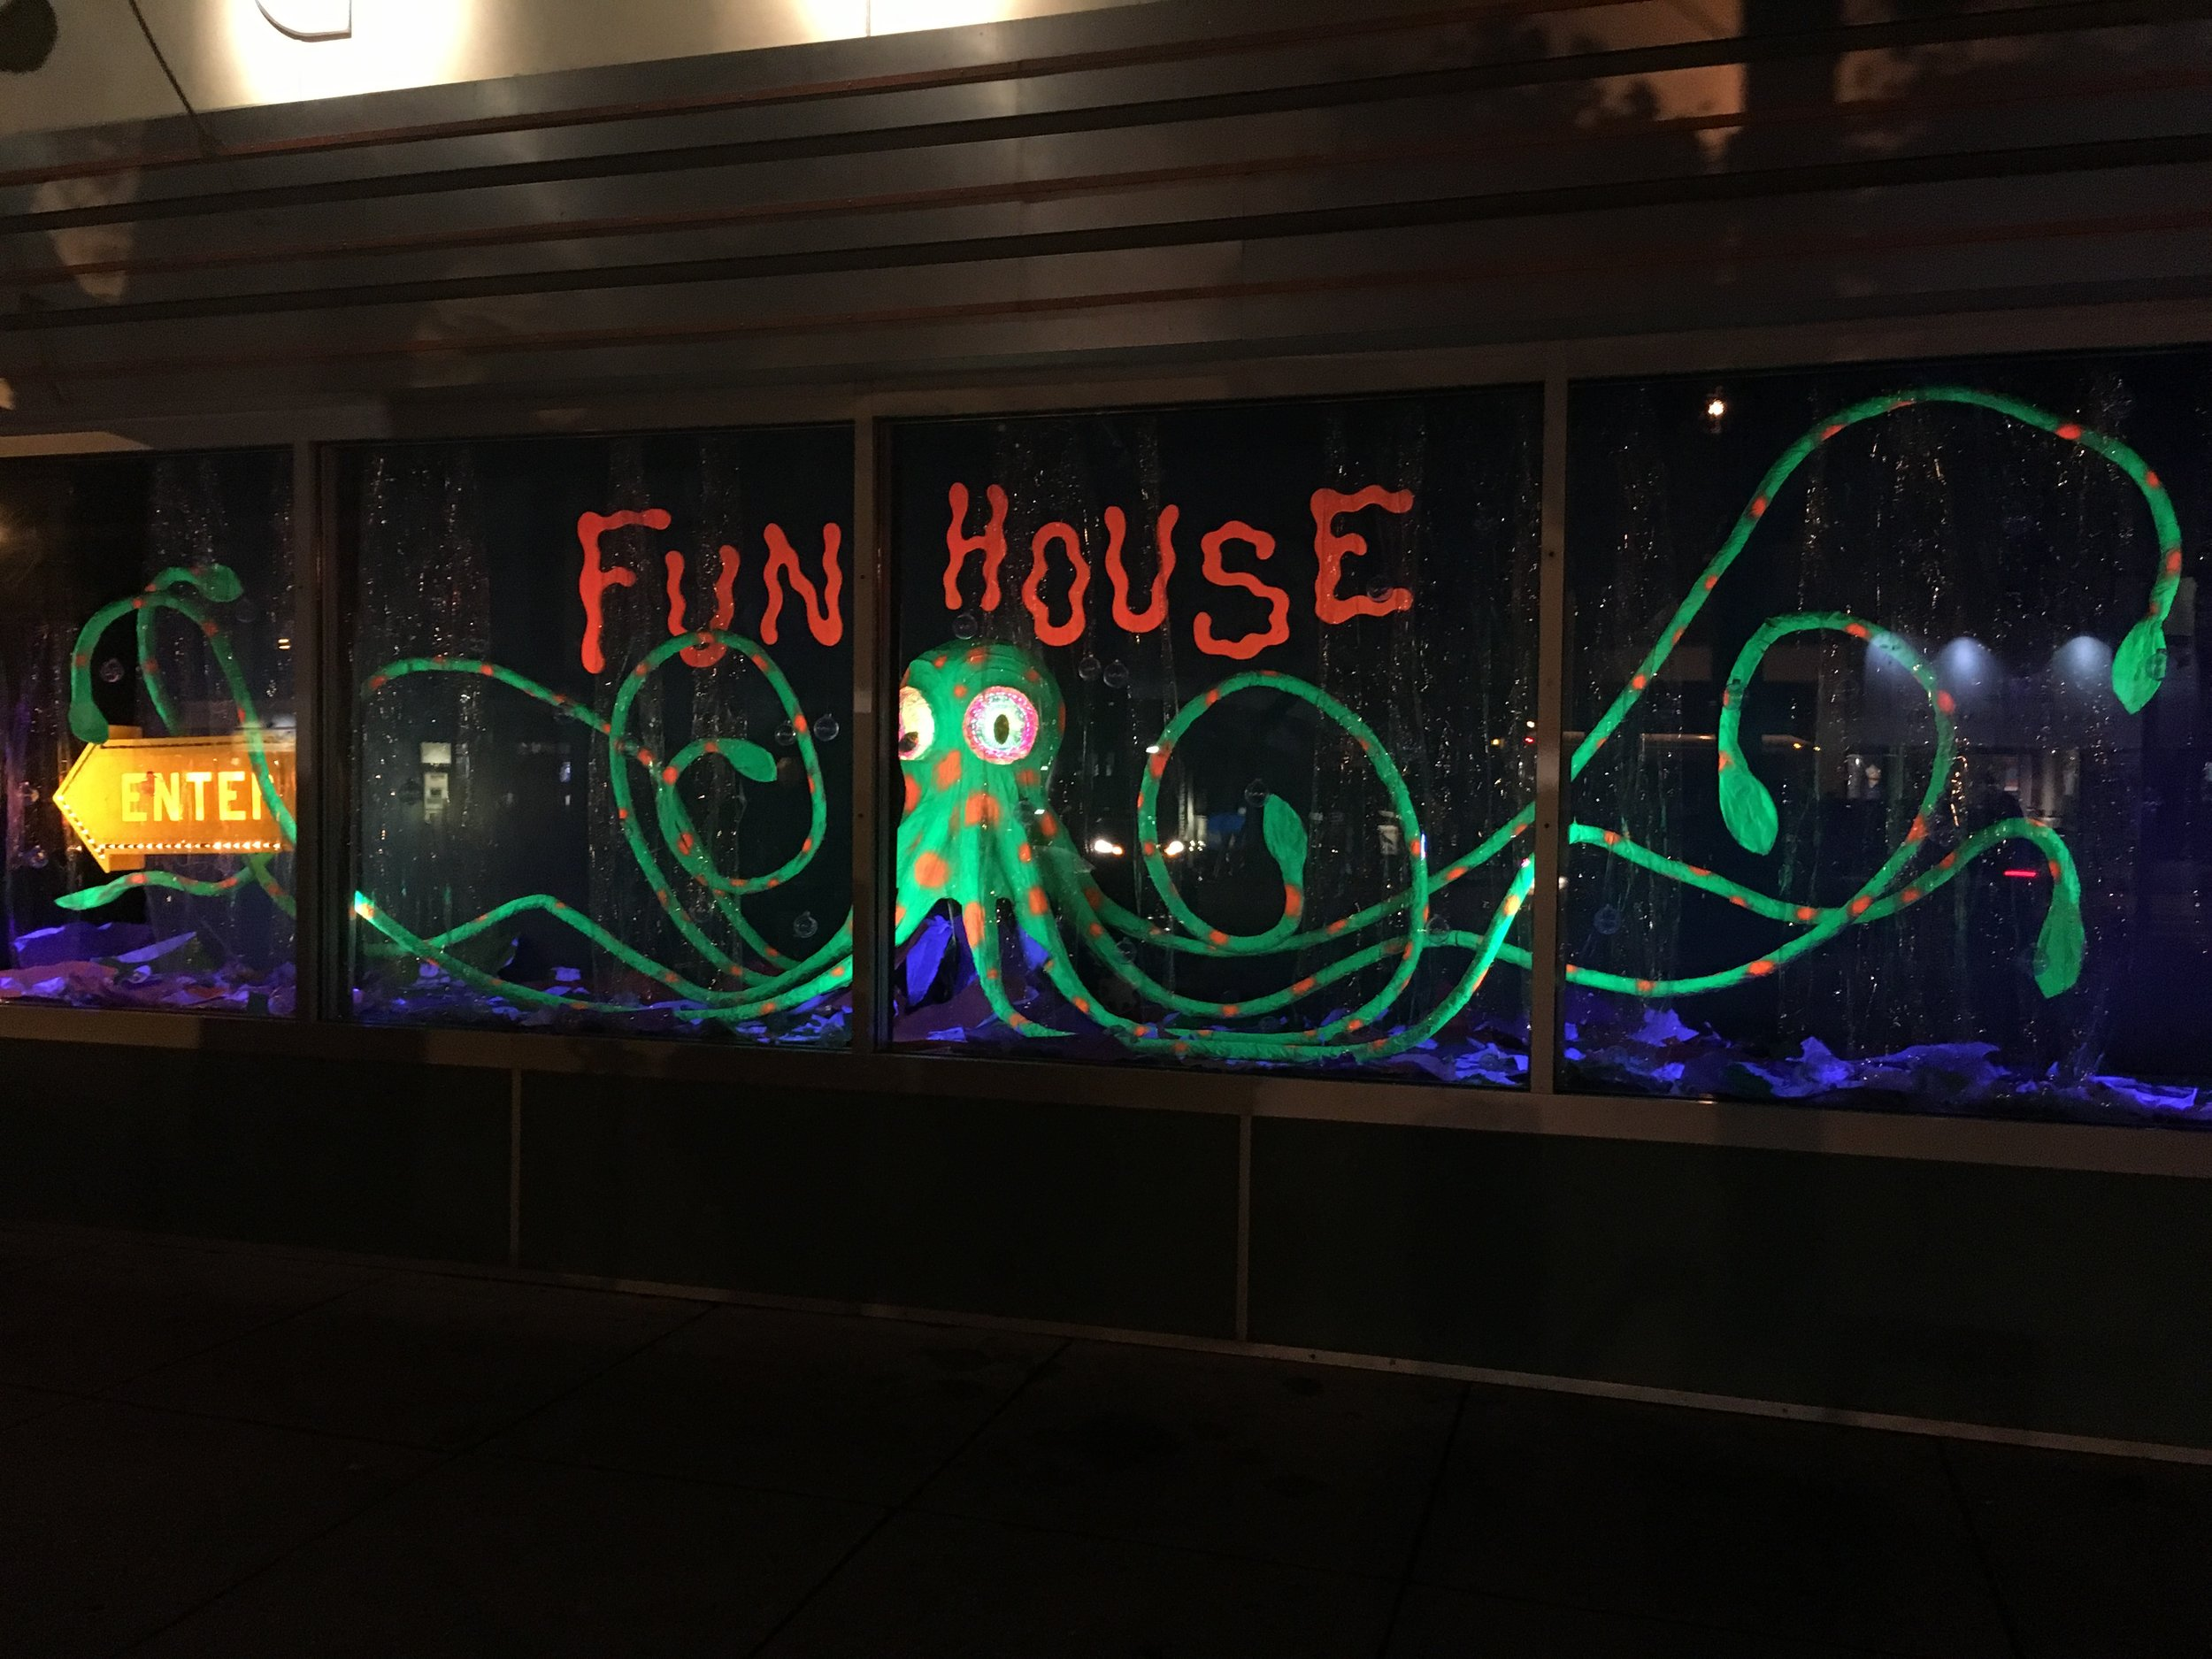 Fun House by night - July 2016